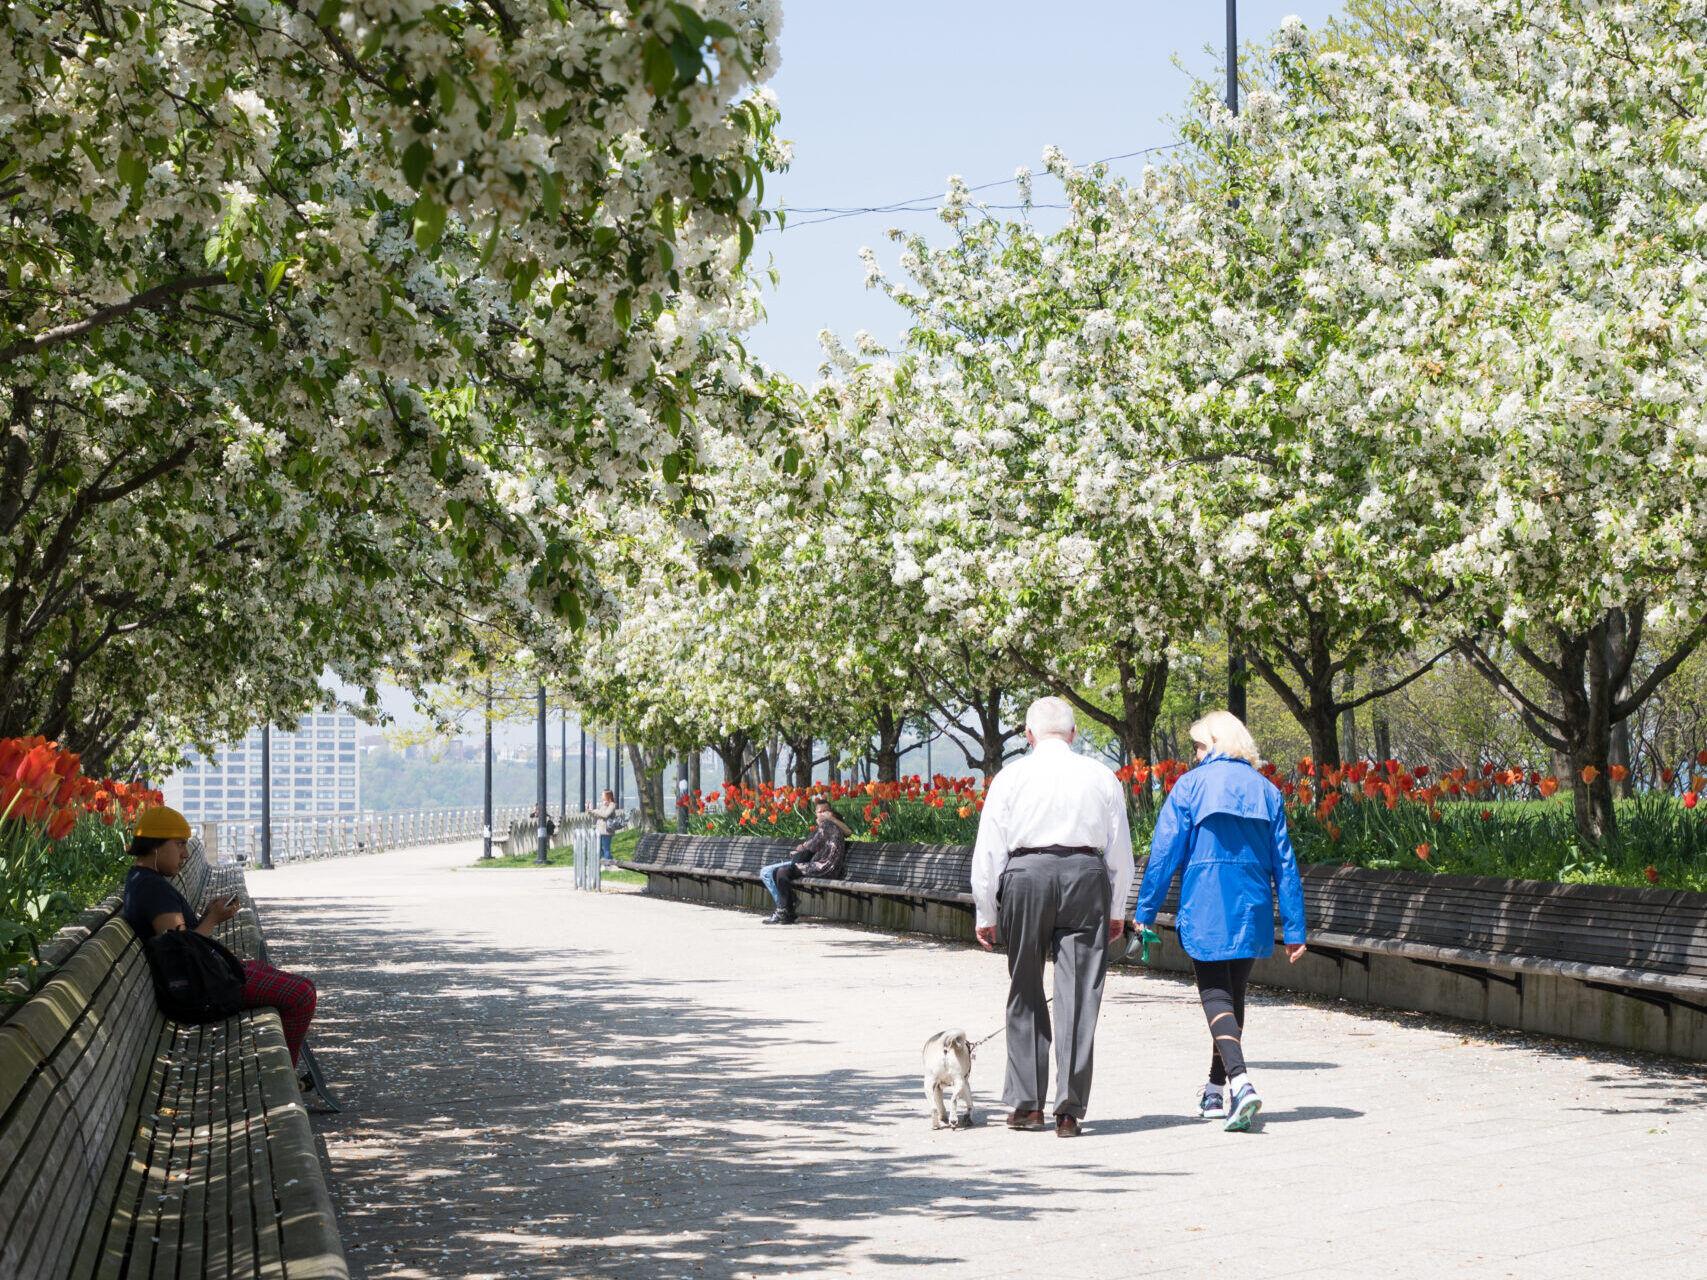 pier 64 couple walking pathway crab apples